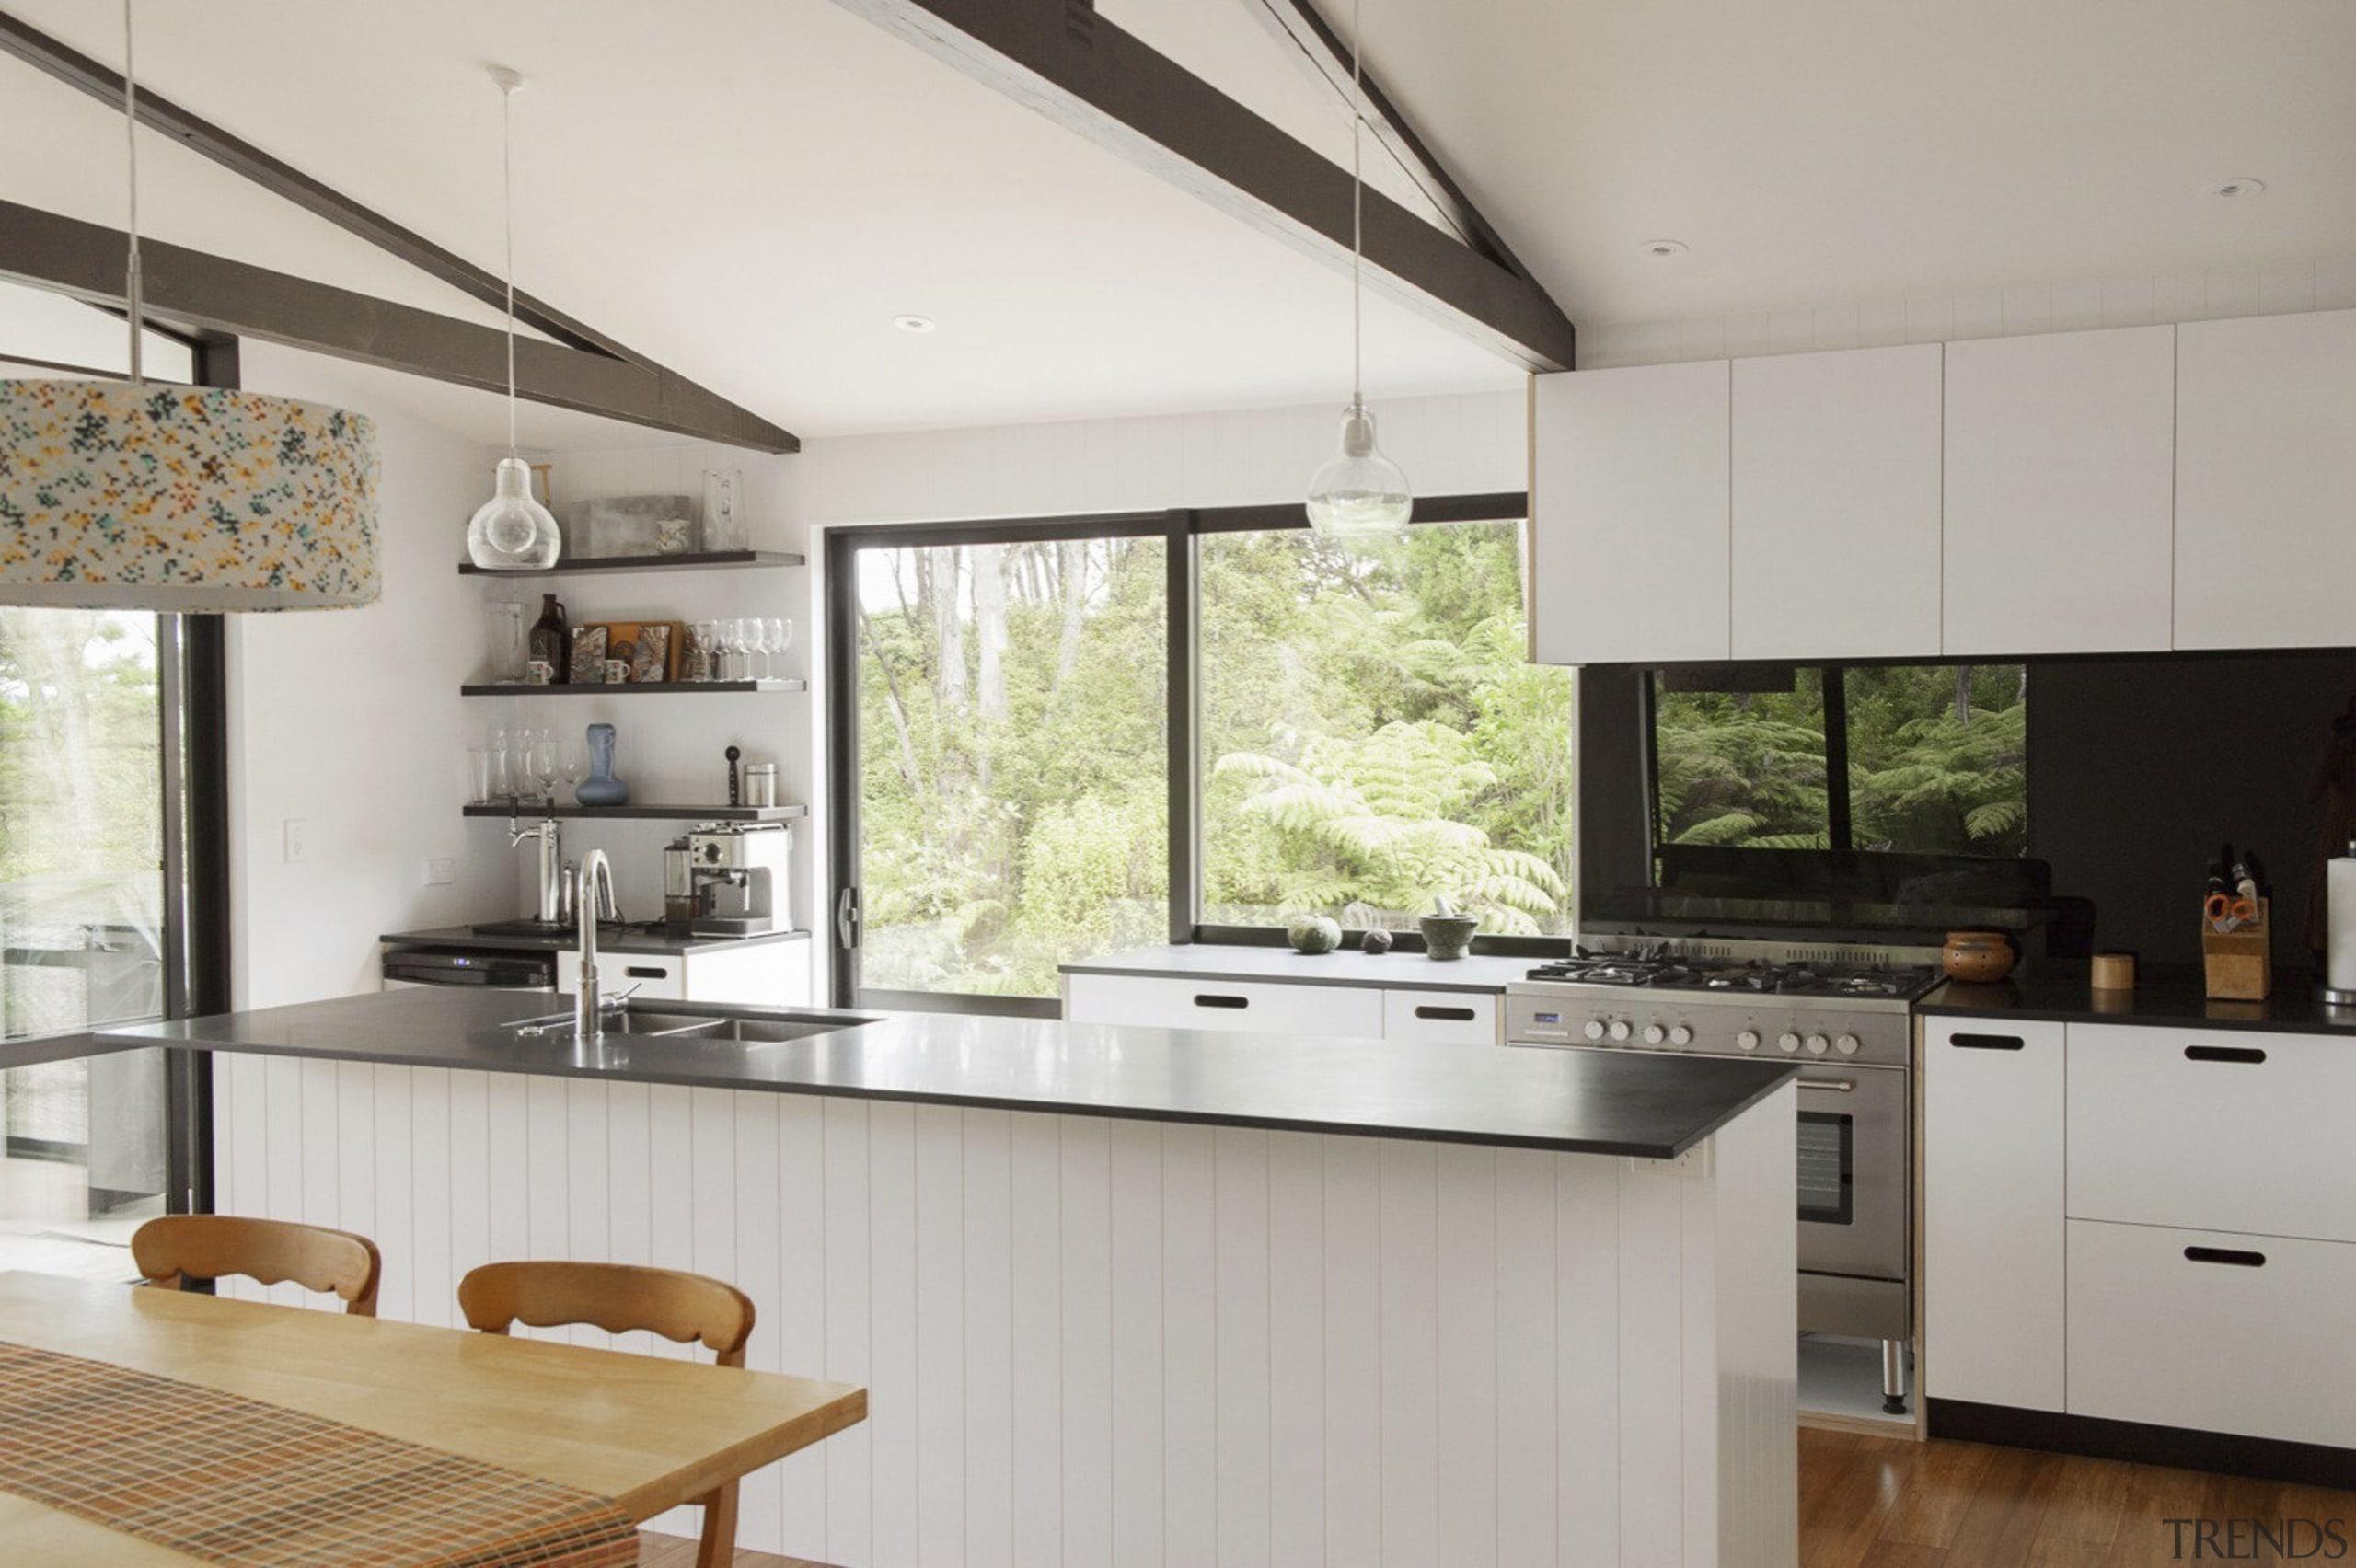 City meets country at Karaka Lakes - City countertop, cuisine classique, interior design, kitchen, real estate, gray